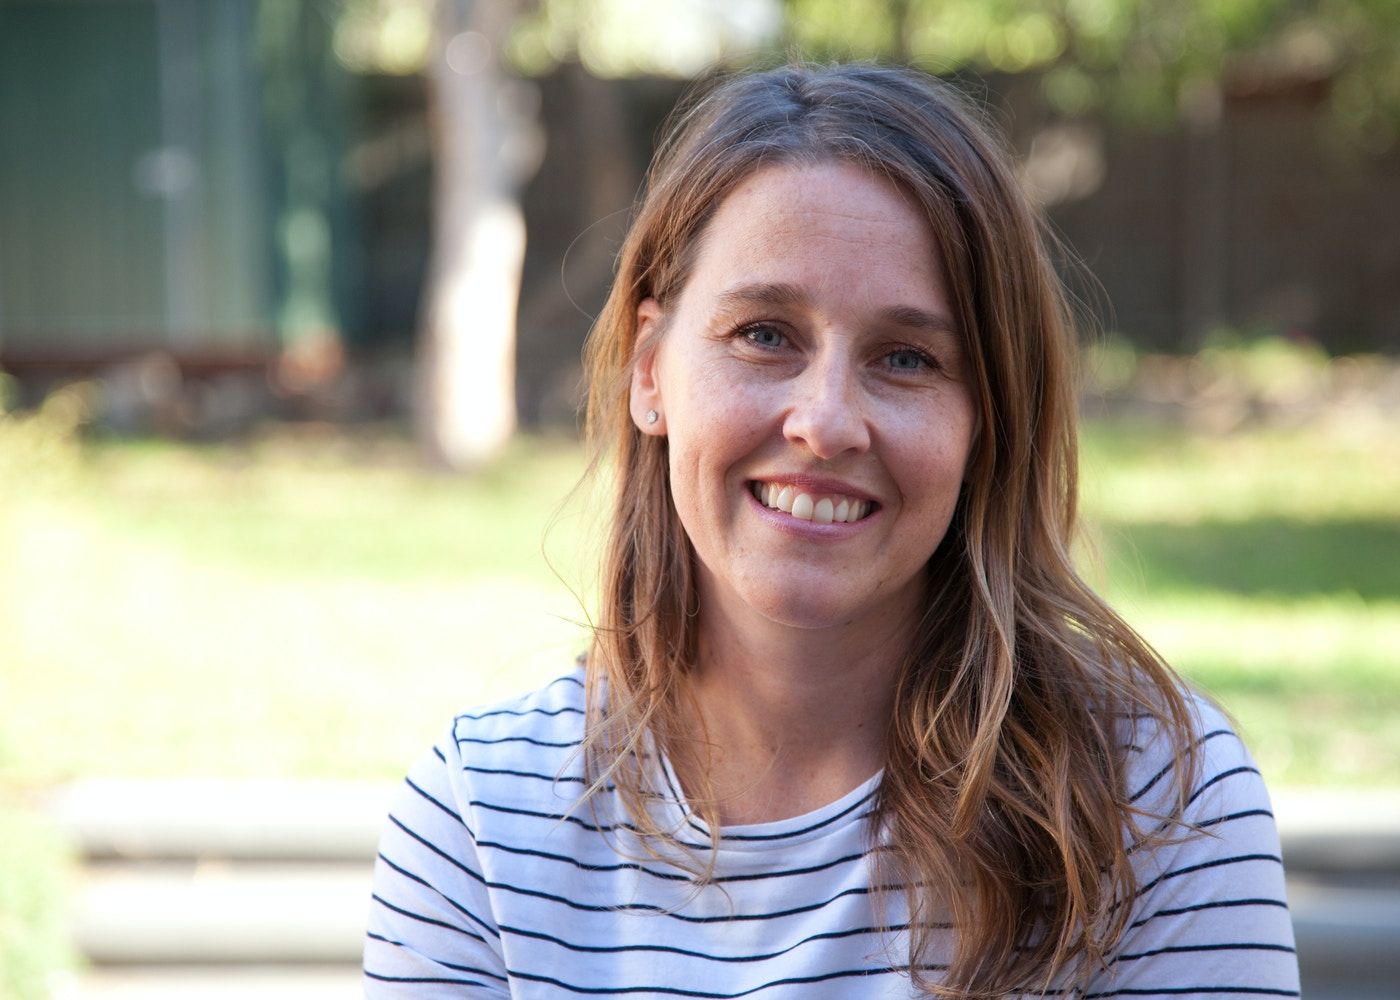 Meet Baby Sleep Expert Kate Johnson